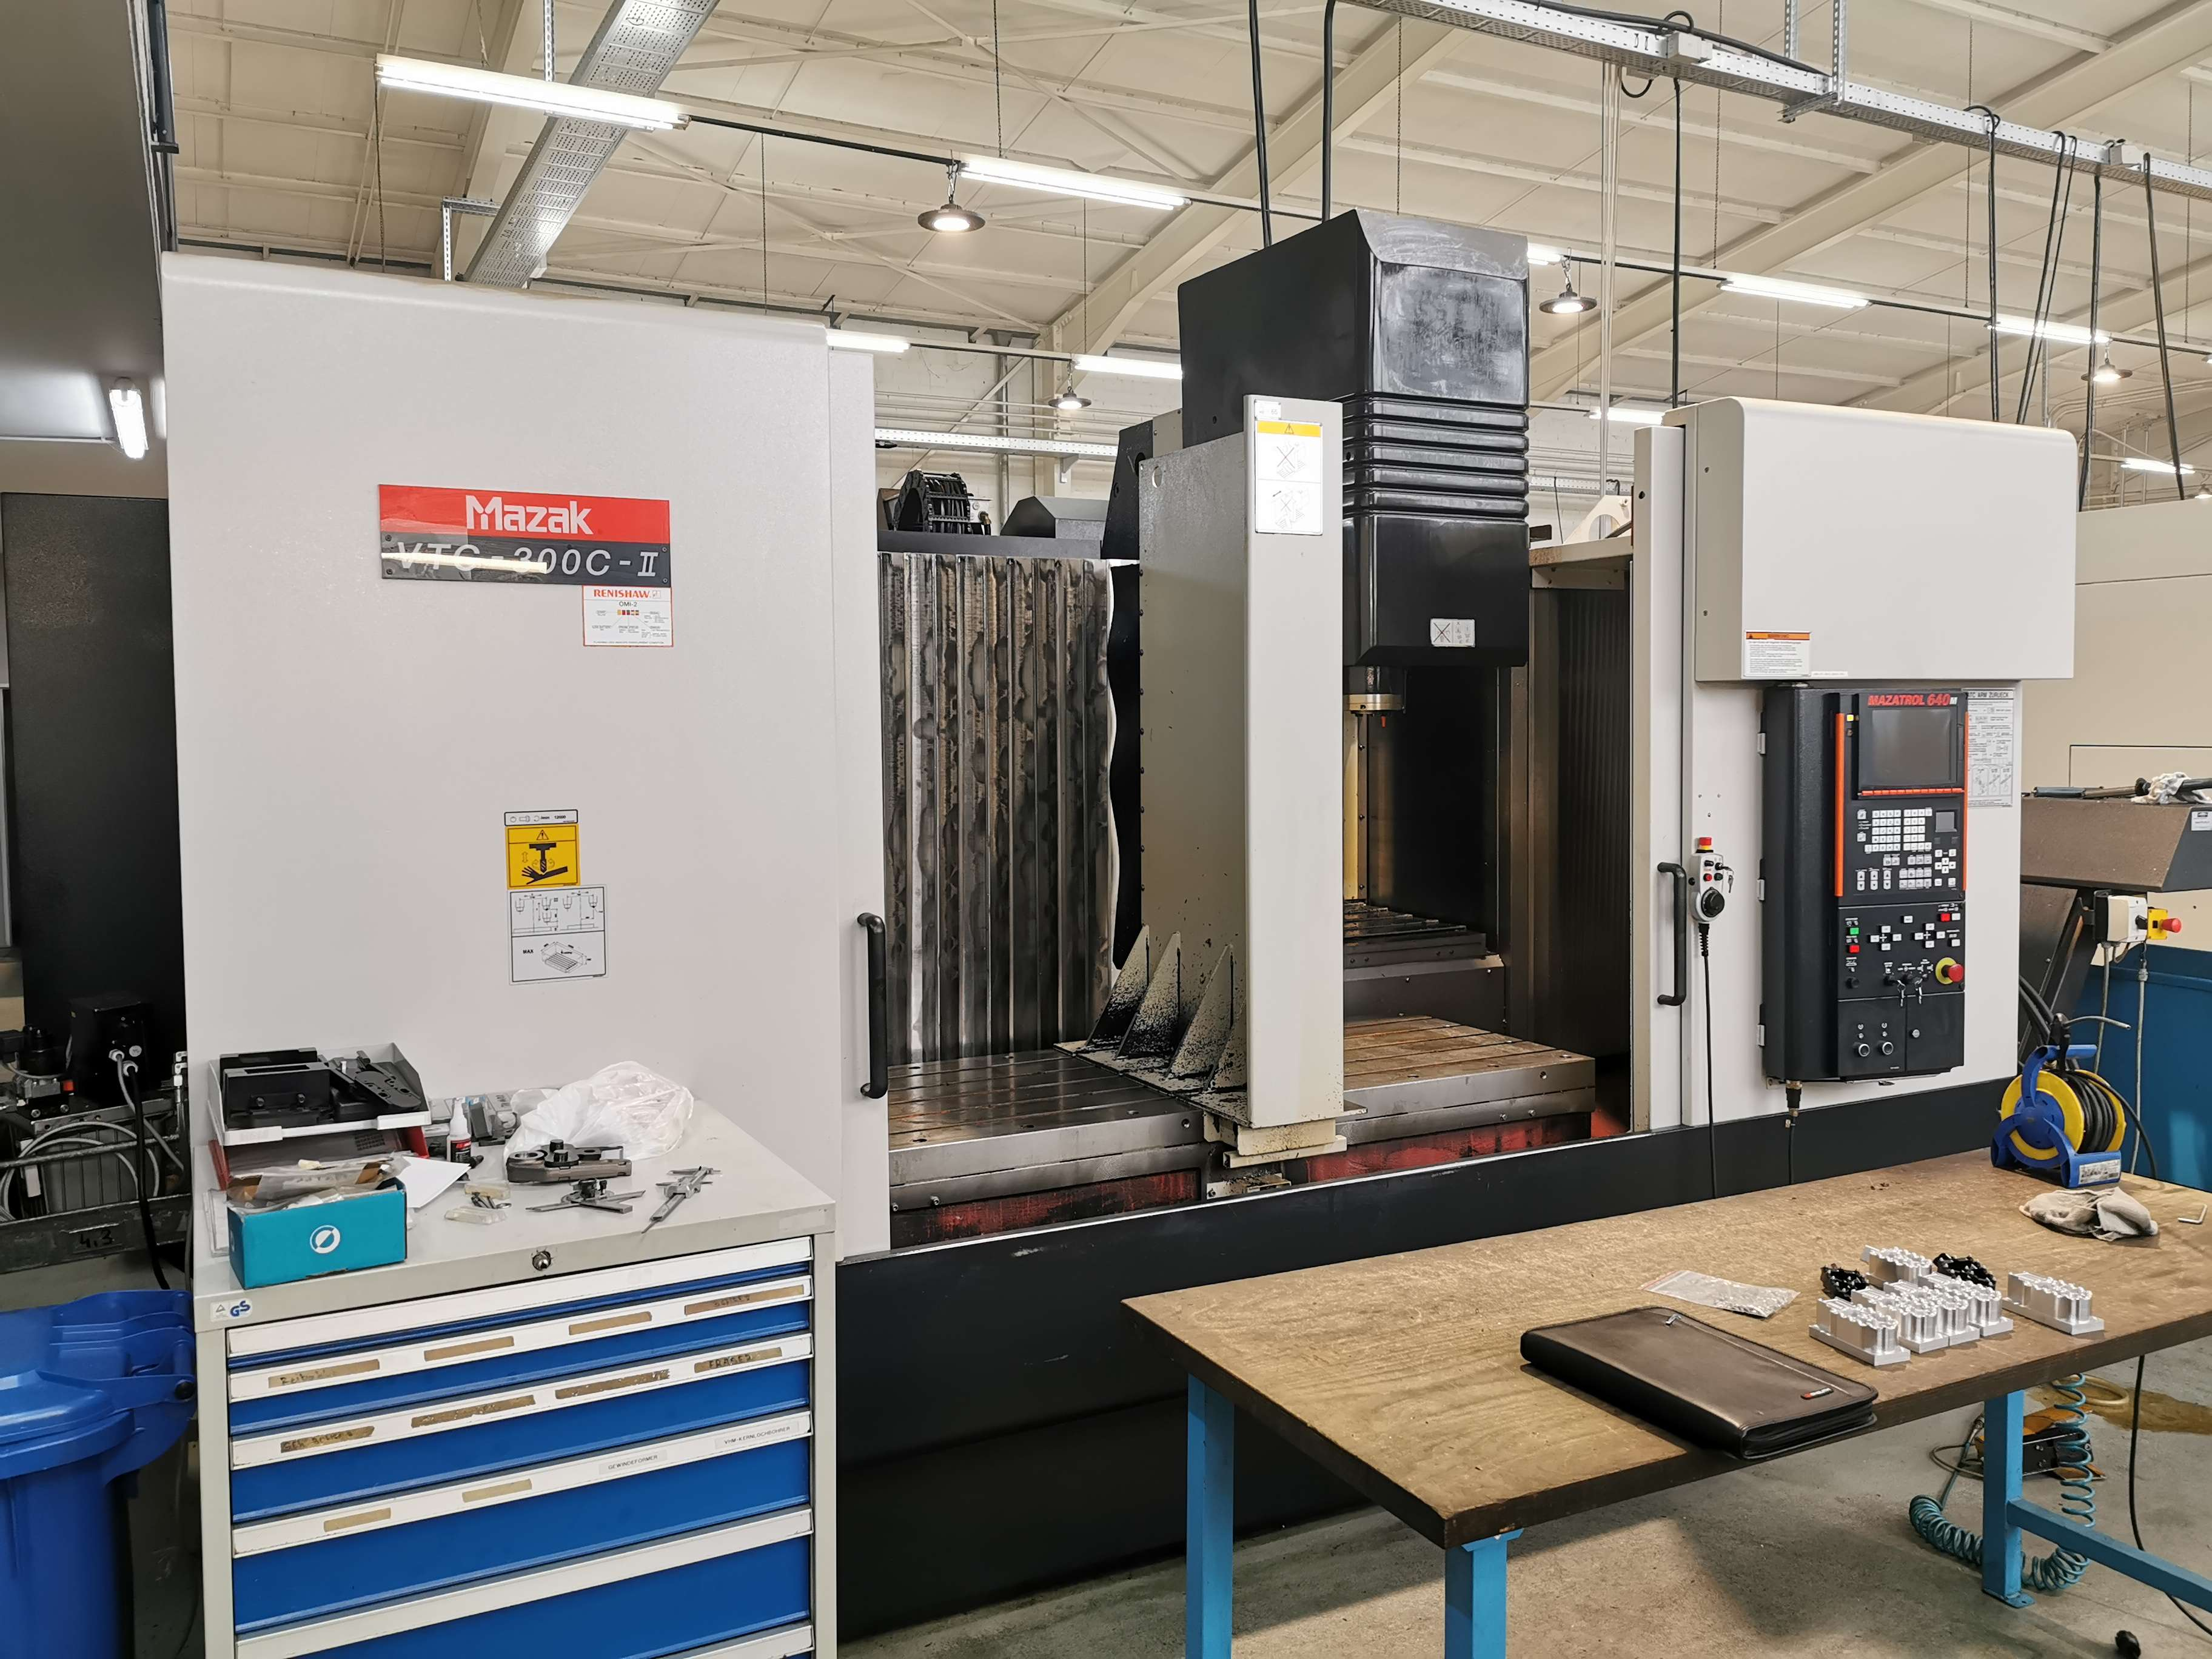 Milling Machine - Vertical CNC Fräsmaschine Mazak VTC 300 C II